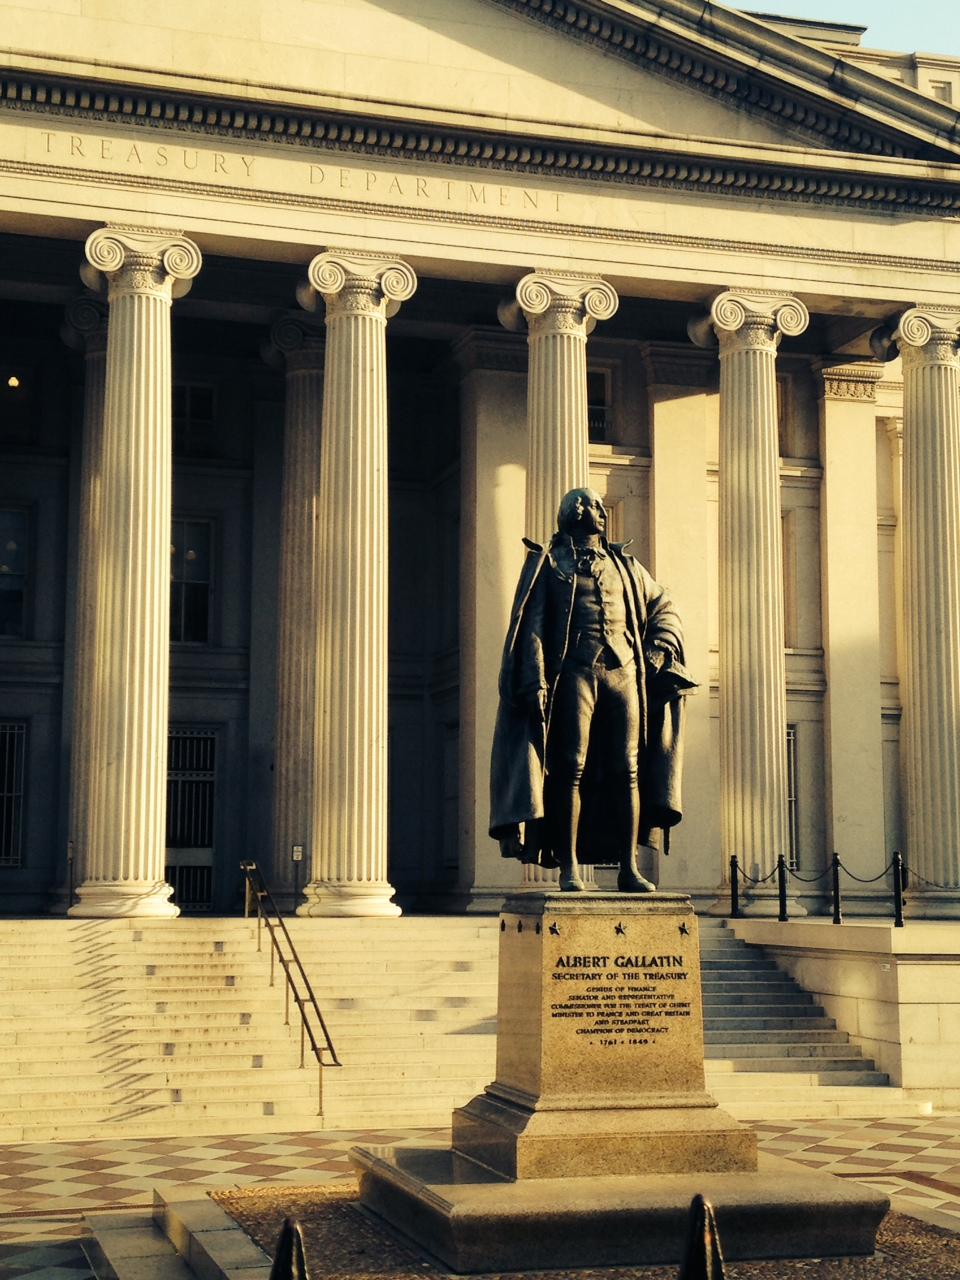 Albert Gallatin statue outside of US Treasury Building